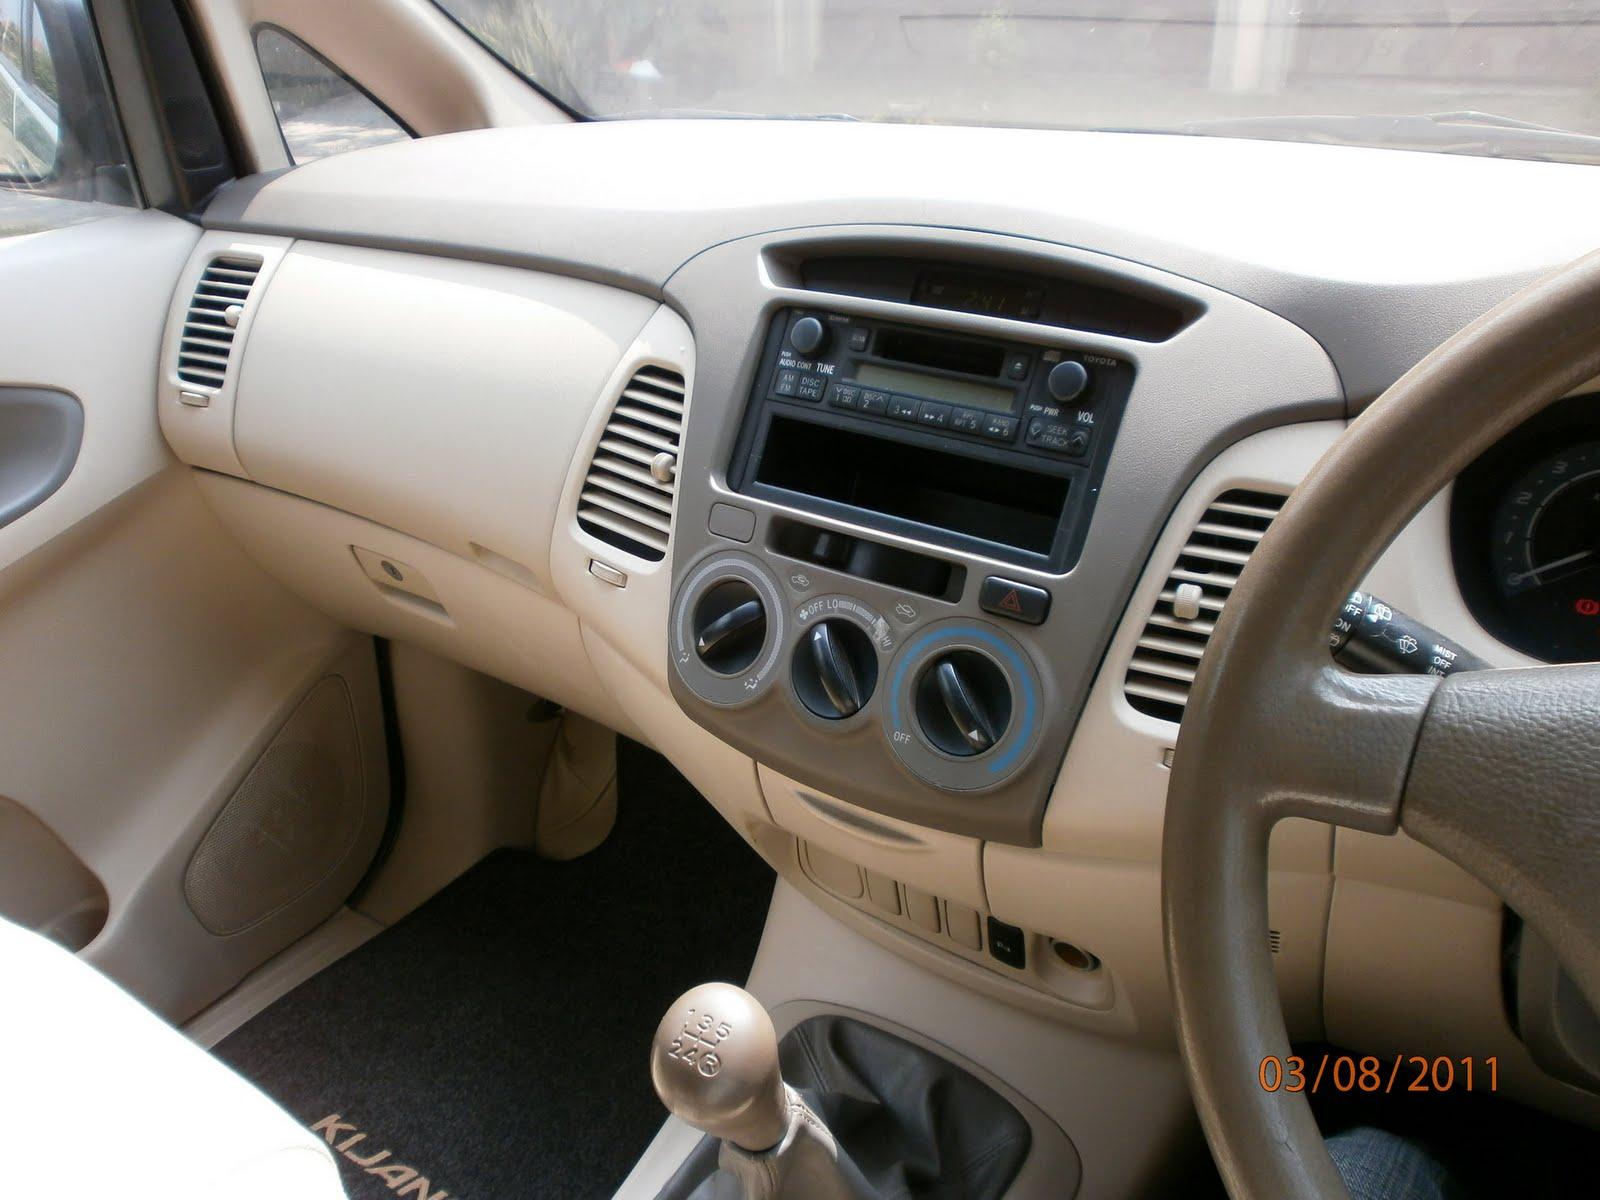 automoda: toyota kijang innova g diesel 2006